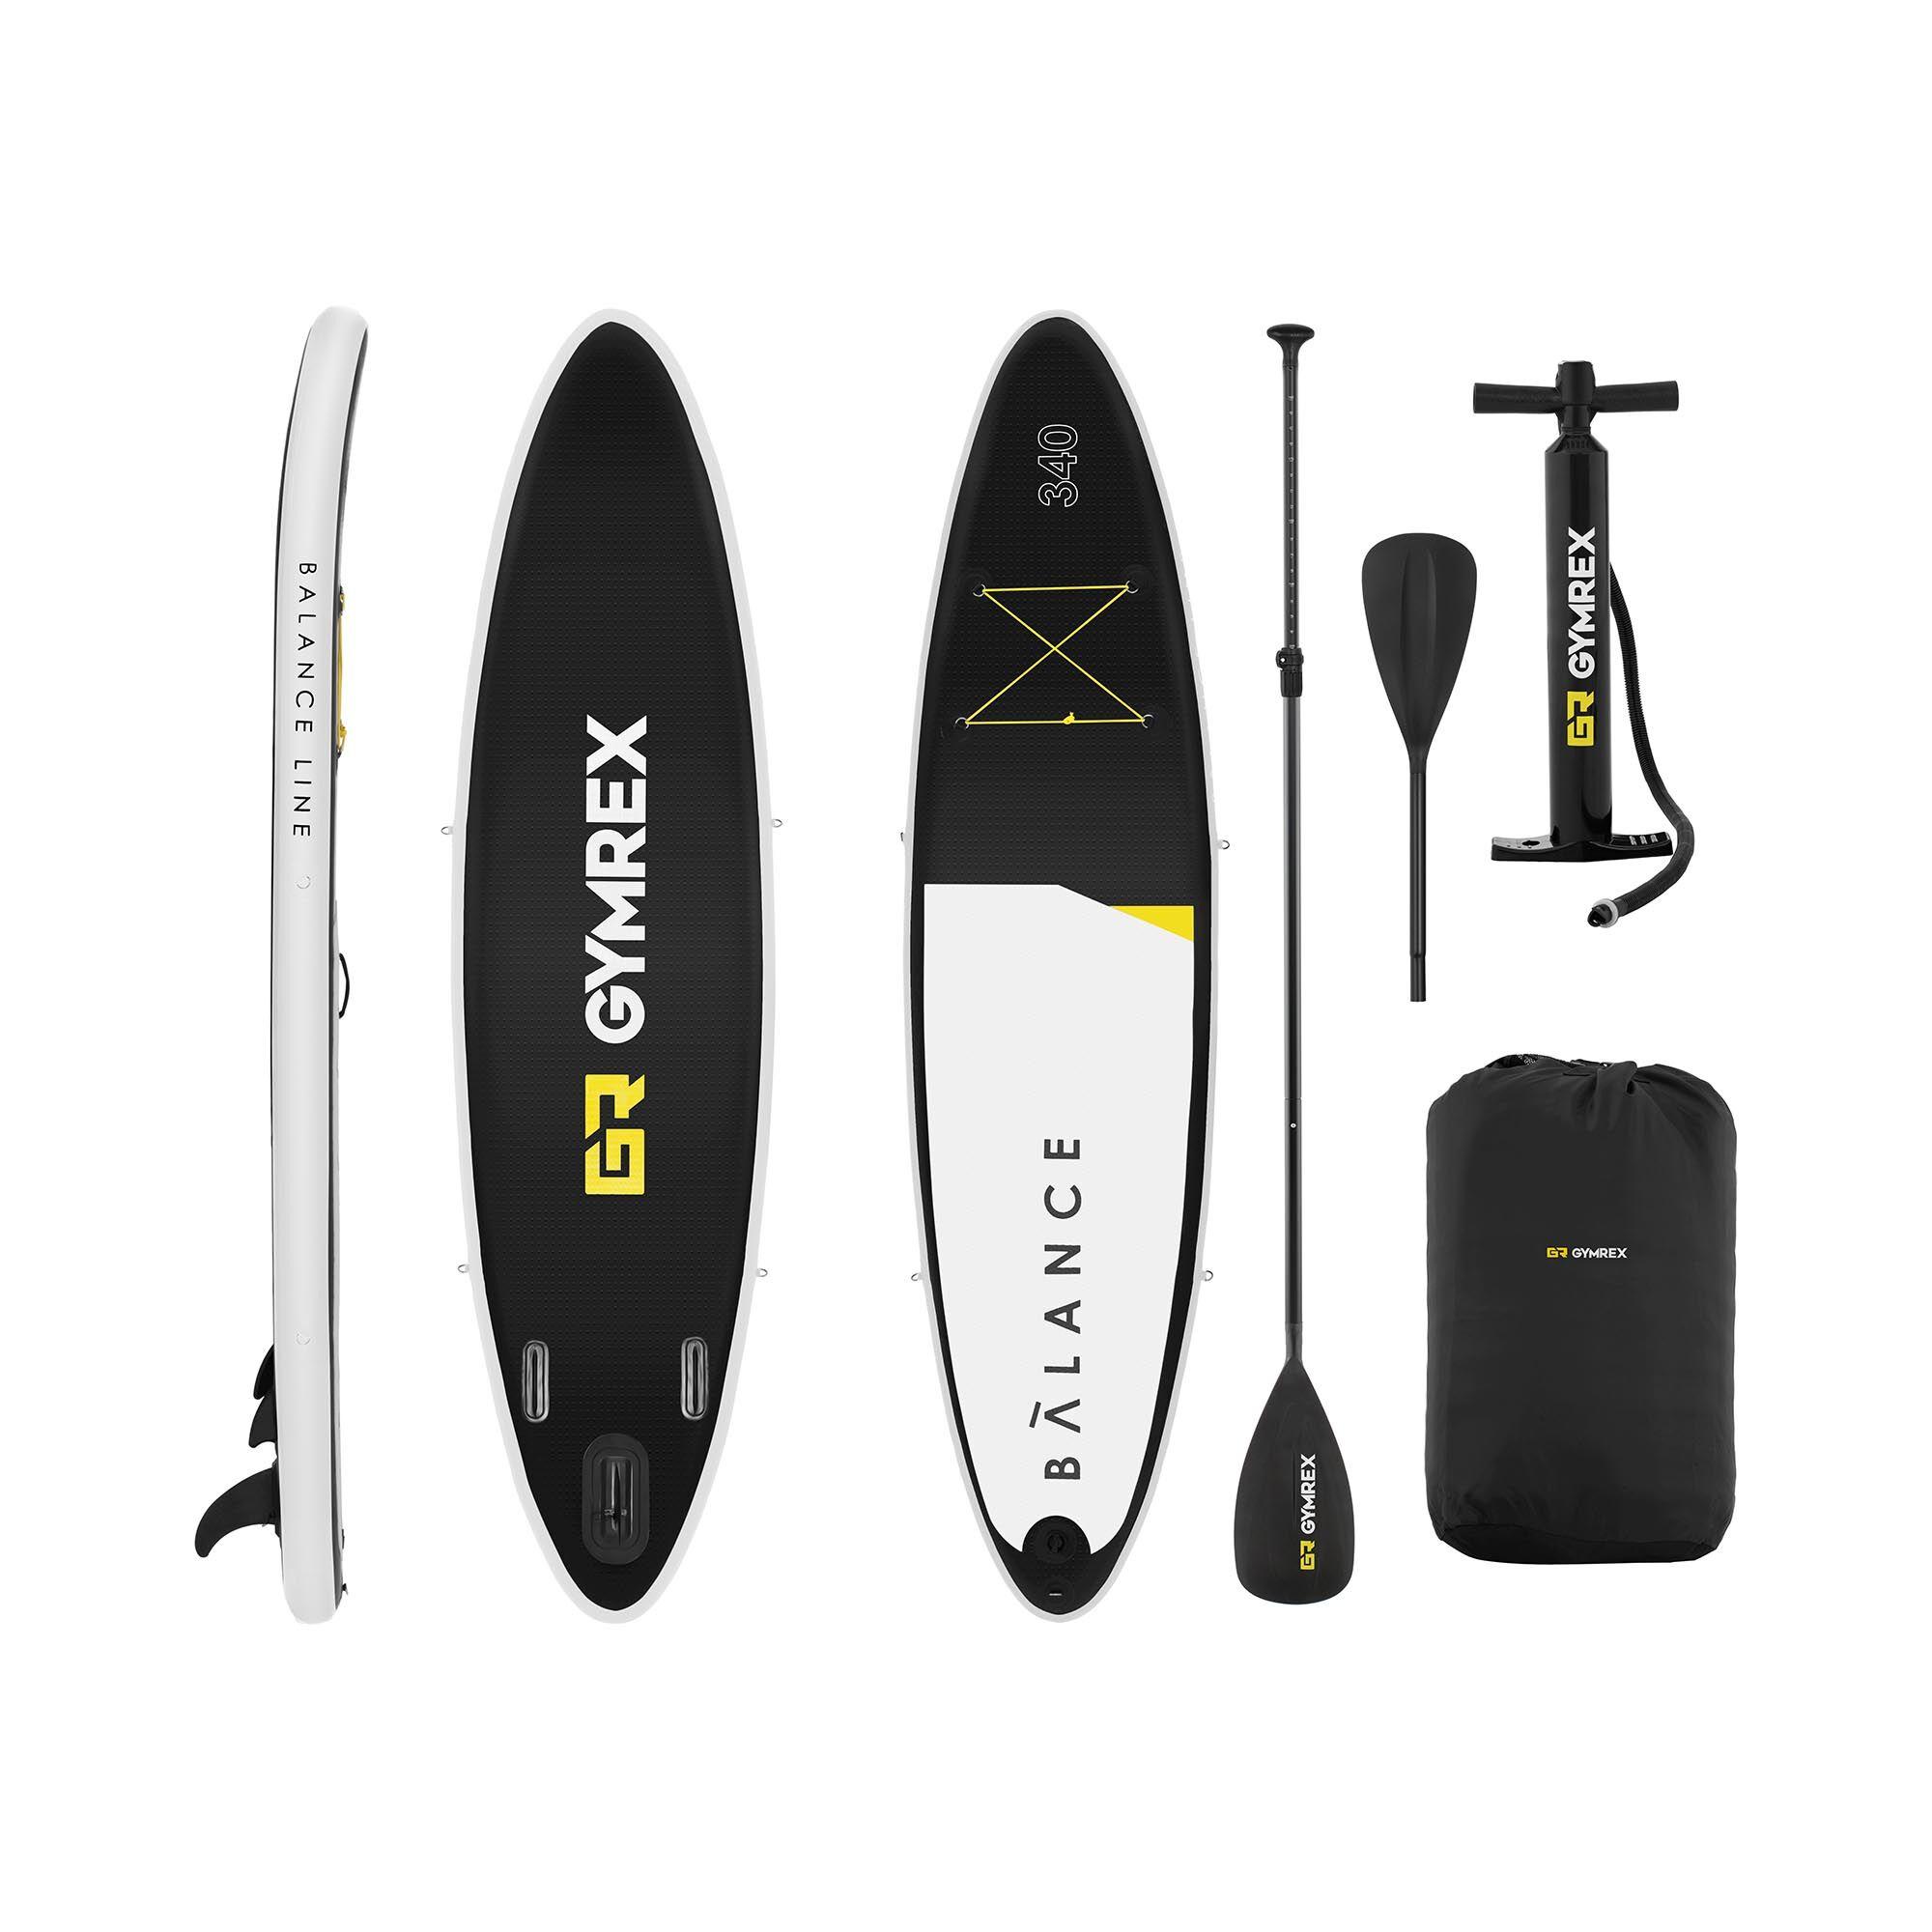 Gymrex Paddle-board - 145 kg - 335 x 79 x 15 cm GR-SPB340